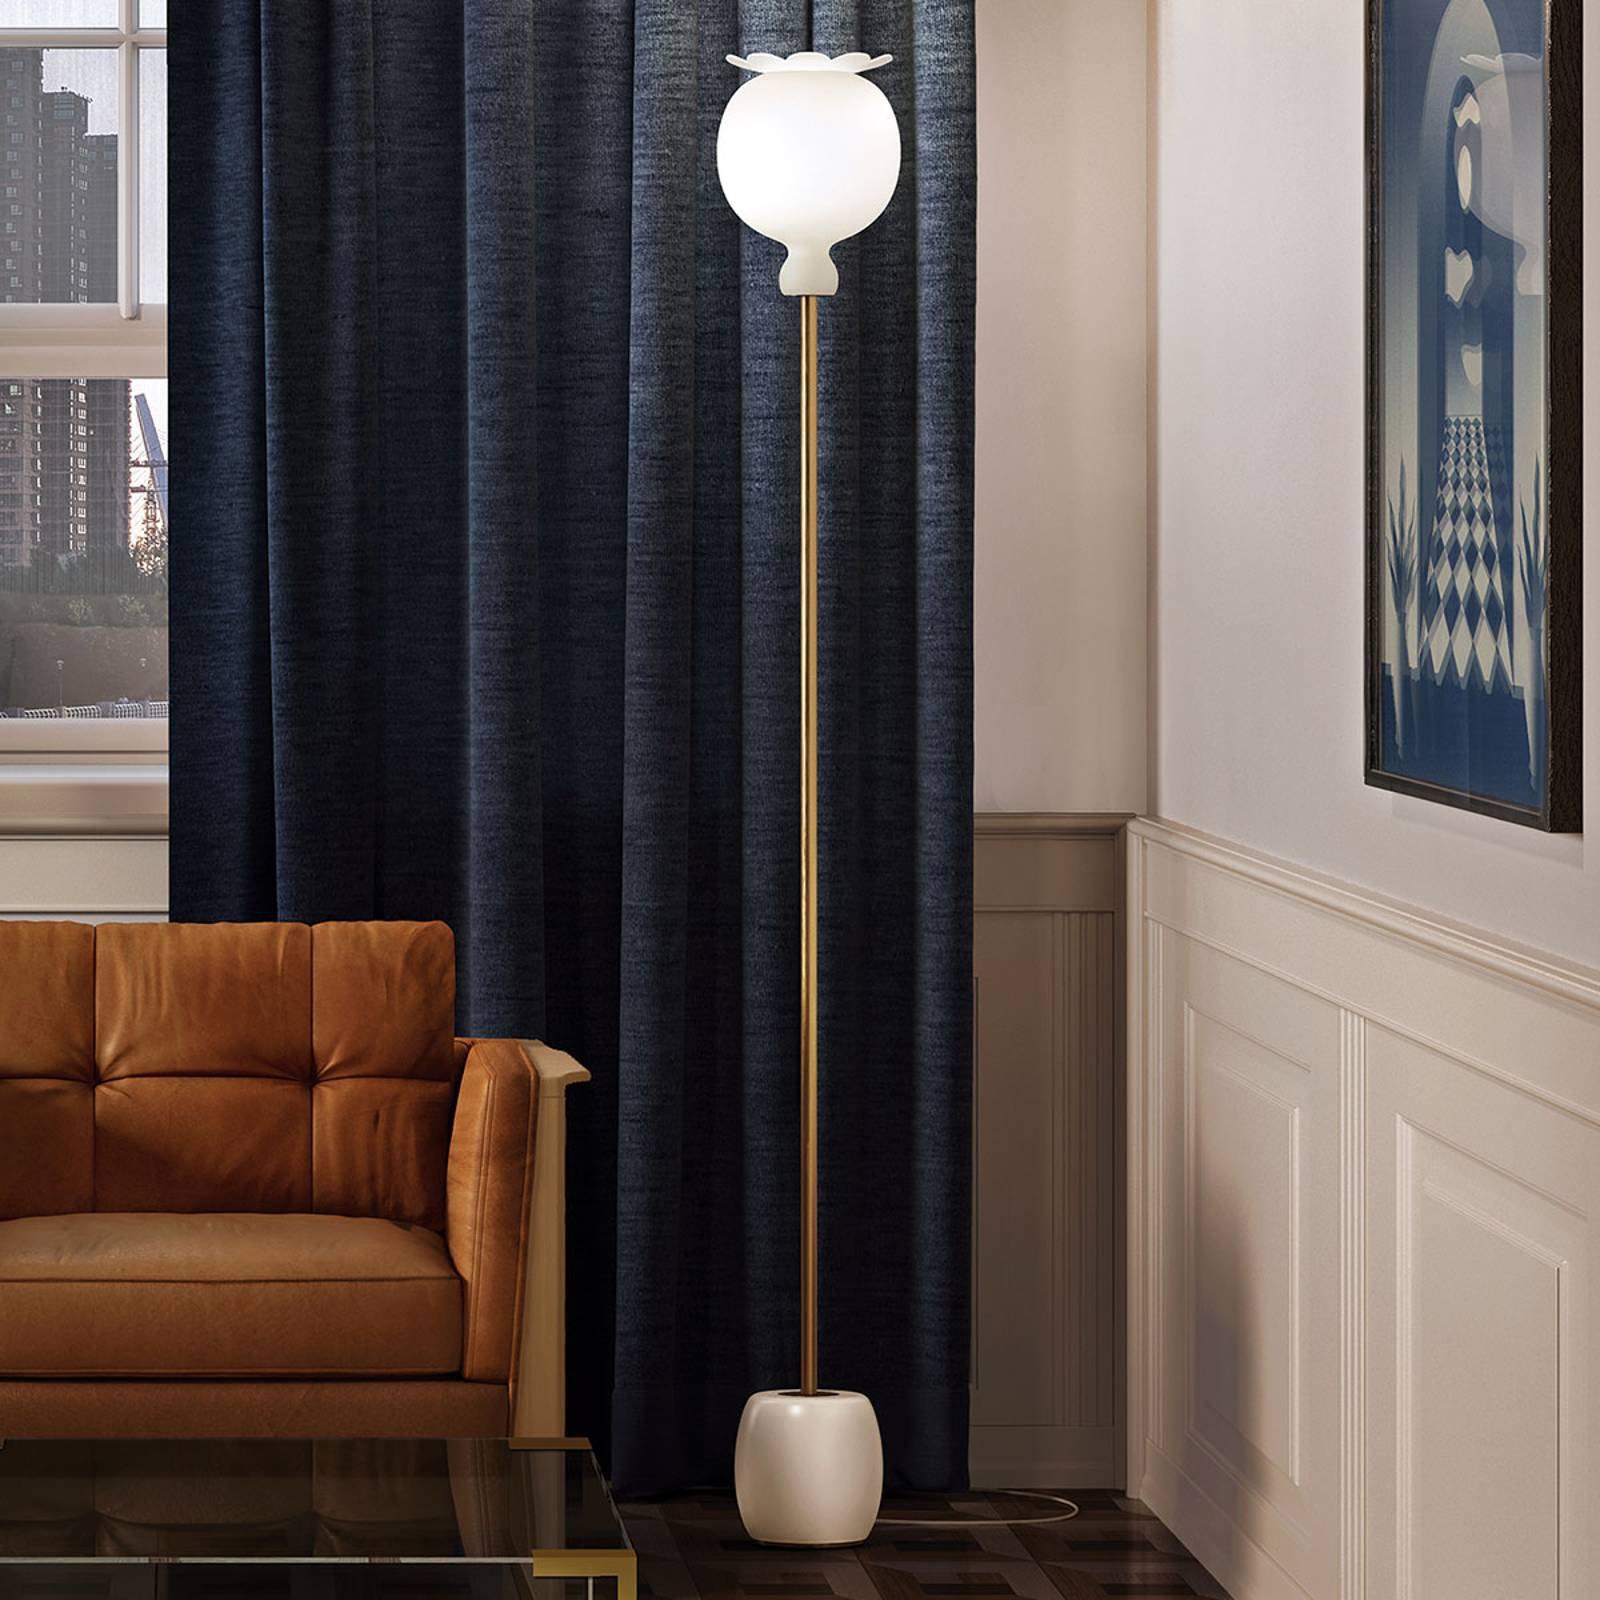 Kundalini Opyo gulvlampe, munnblåst, hvit